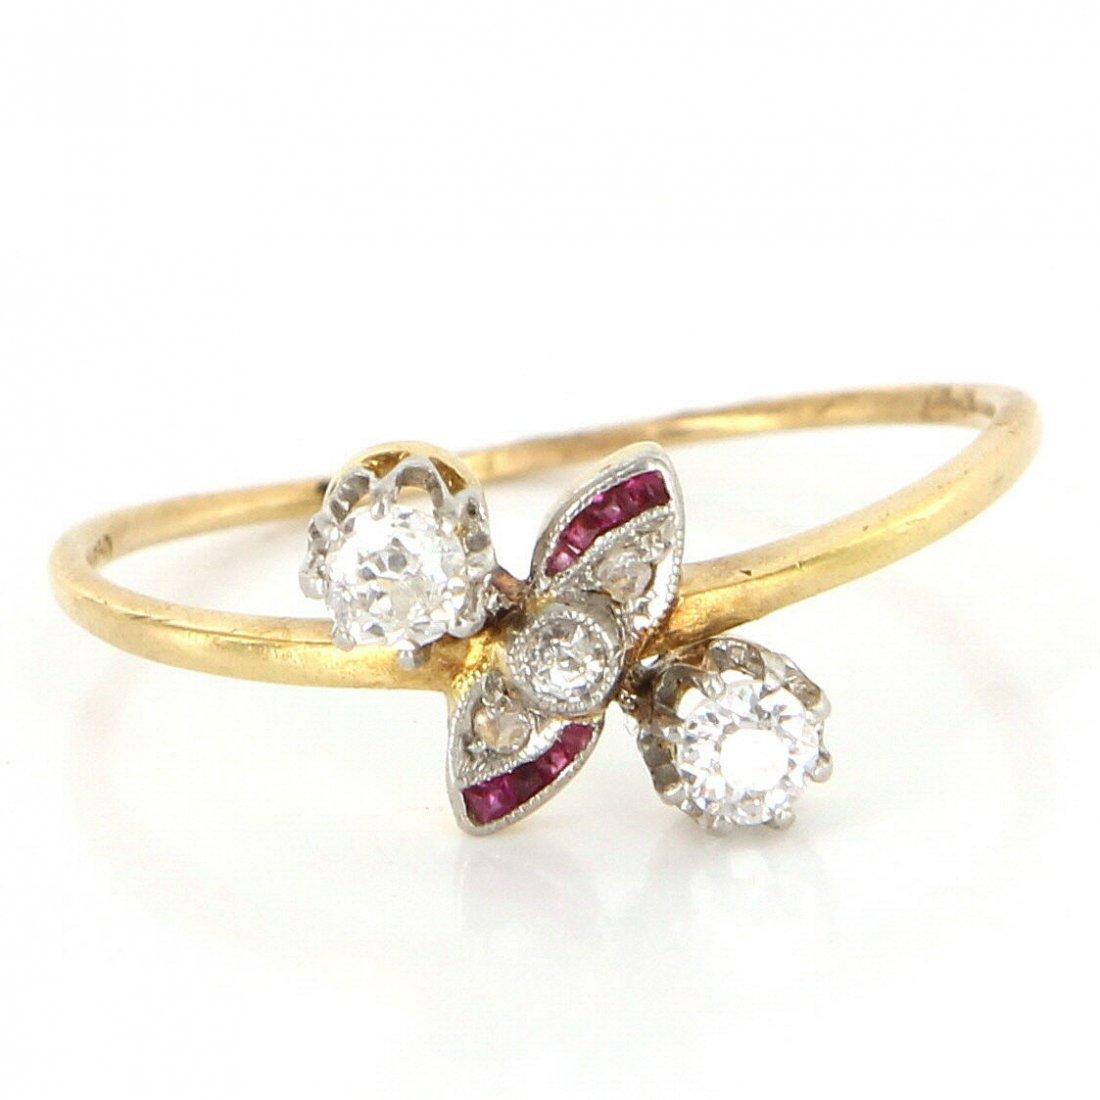 Antique Art Deco 18 Karat Yellow Gold Diamond Ruby Ring